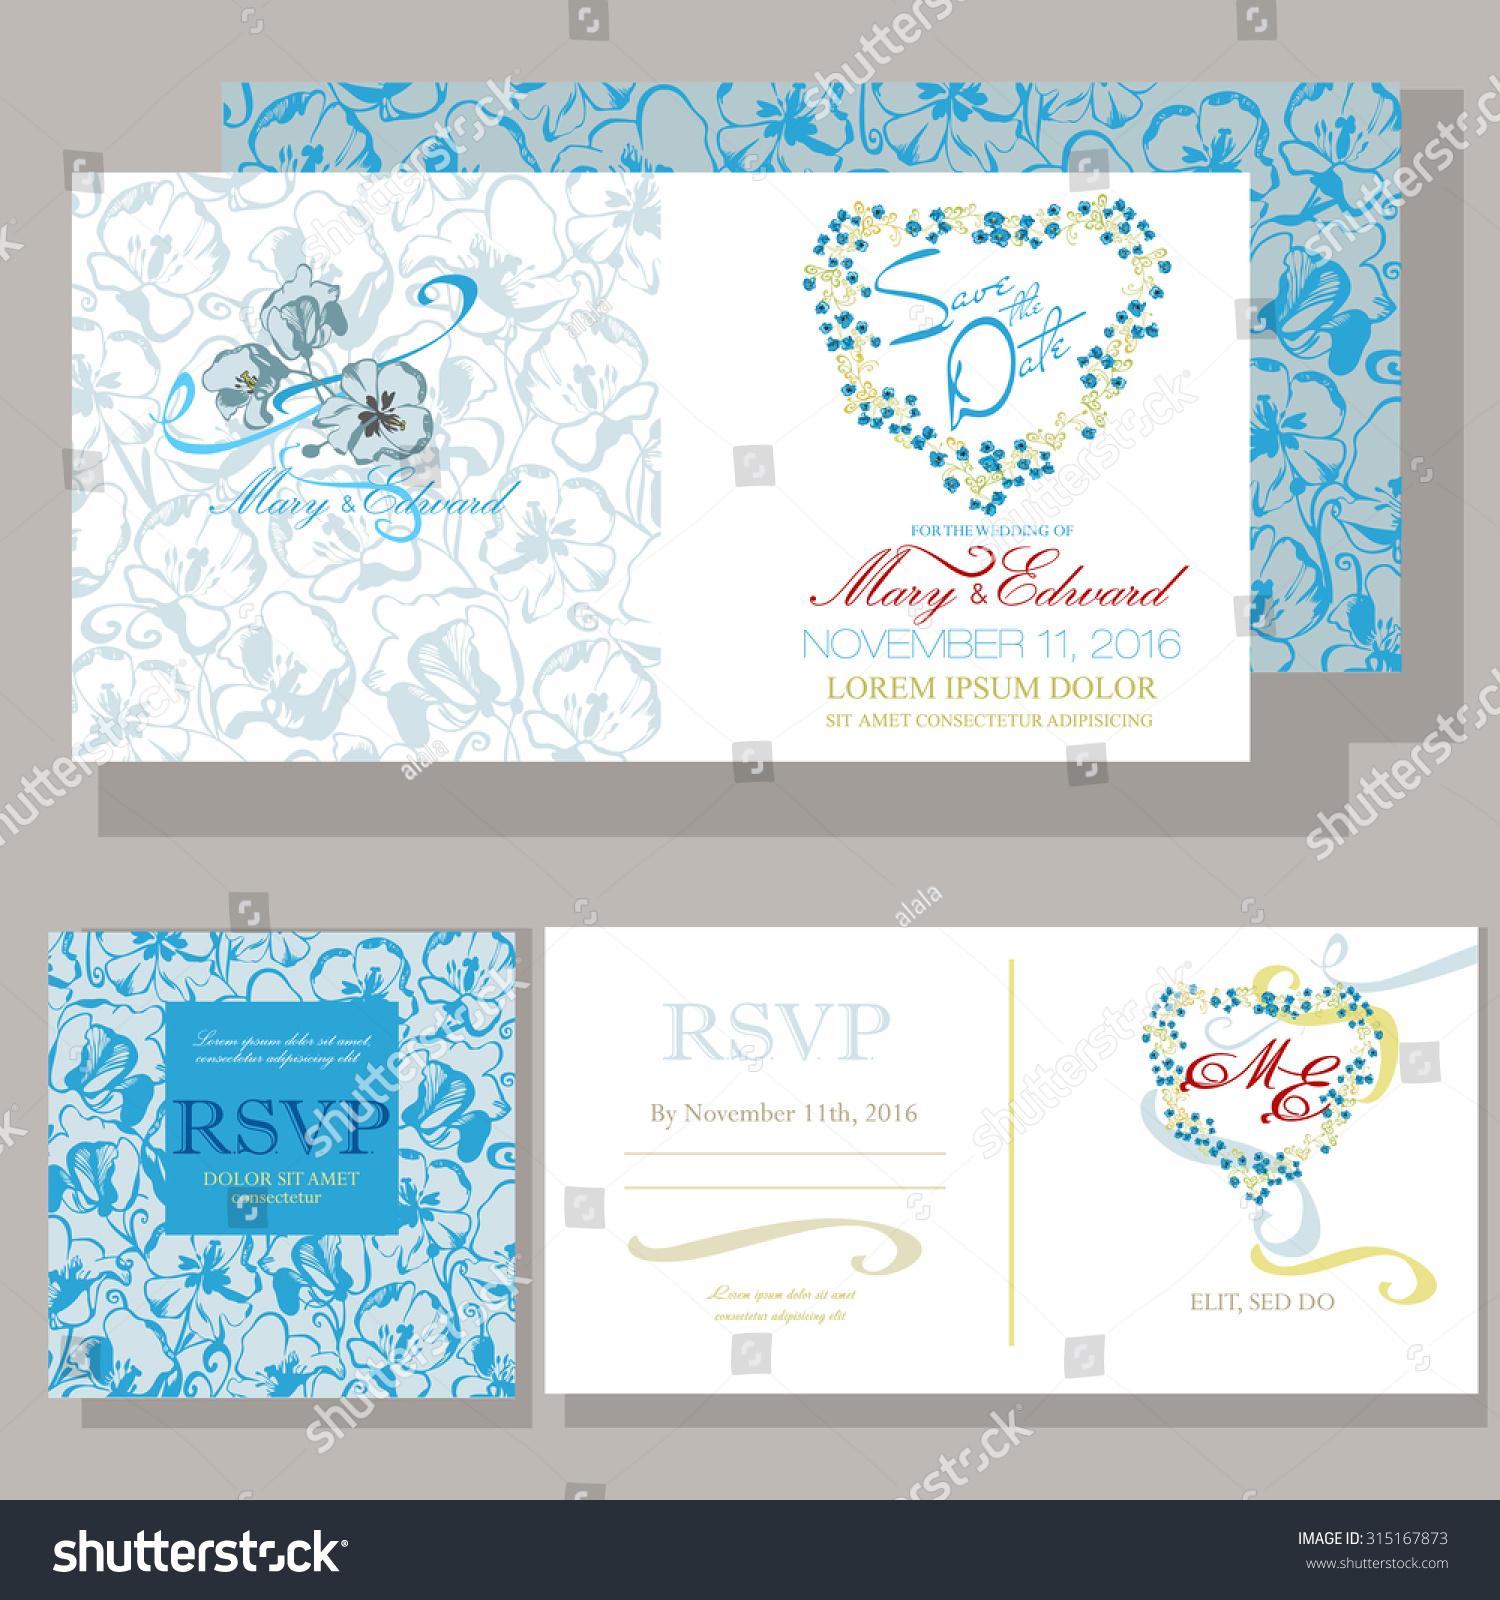 Wedding Invitation Ornamented Blue Flowers Design Stock Vector ...